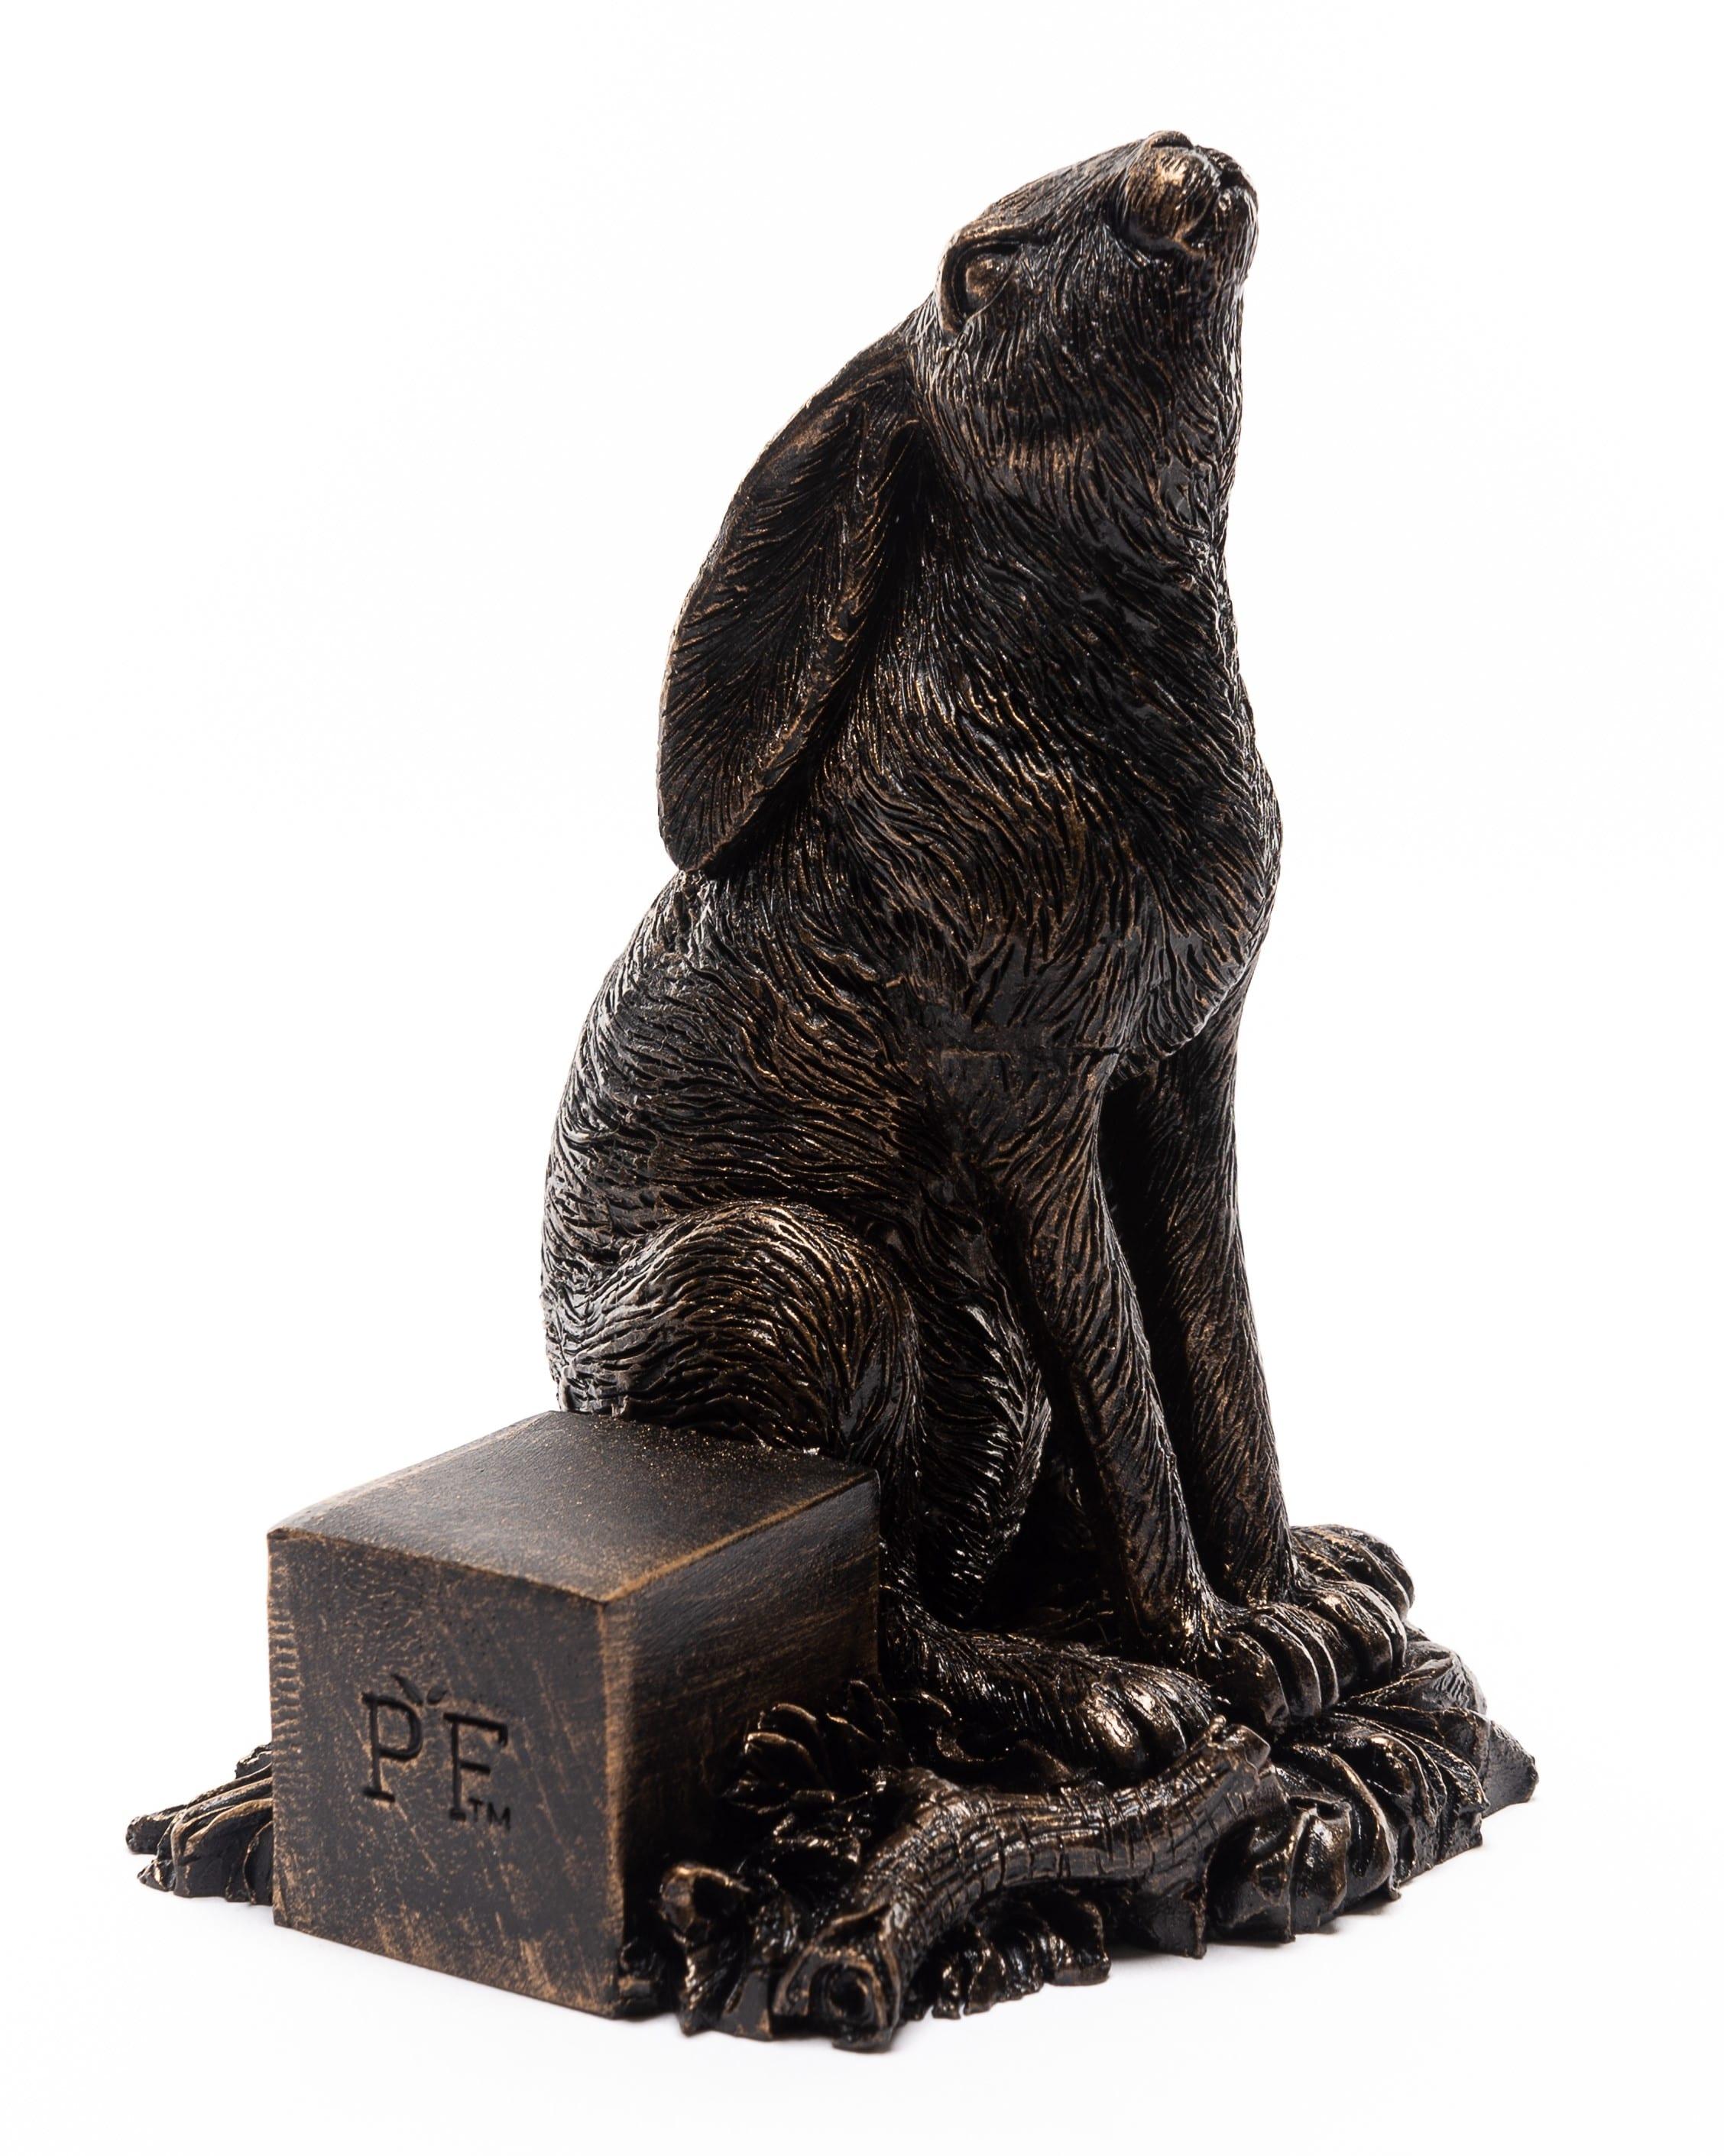 Bronze Moon Gazing Hare Set of 3